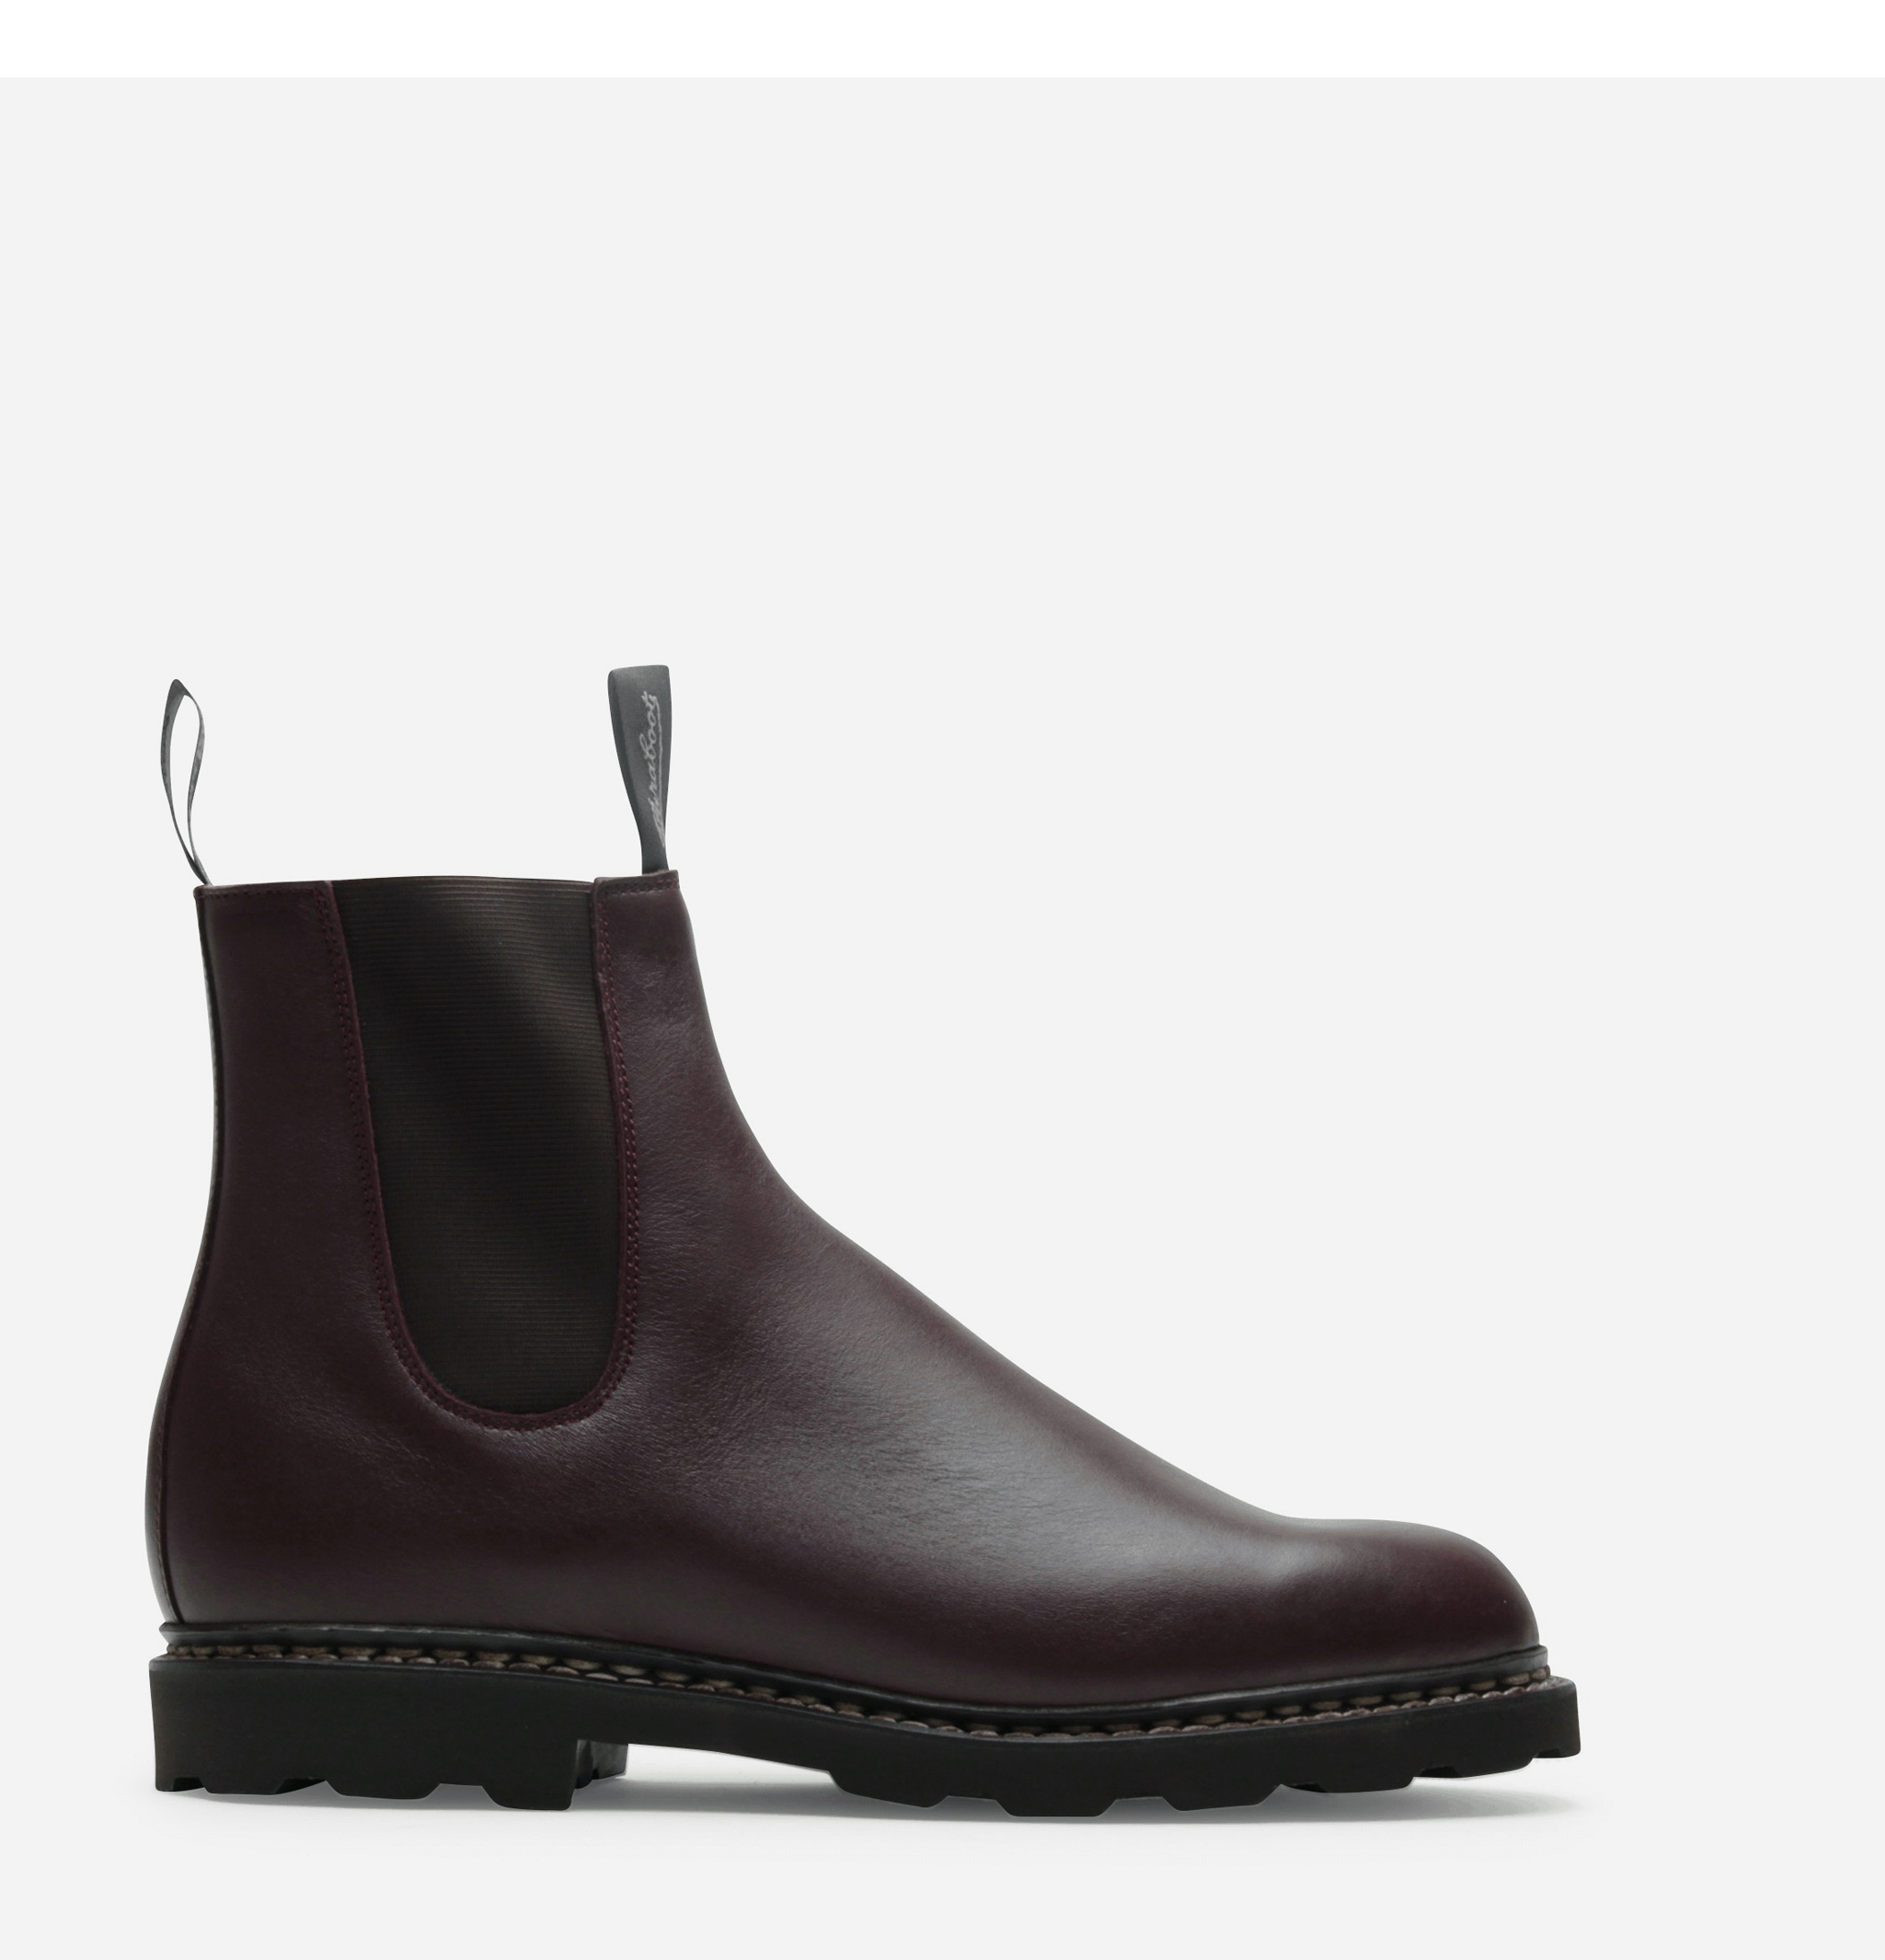 Chaussures Elevage Acajou